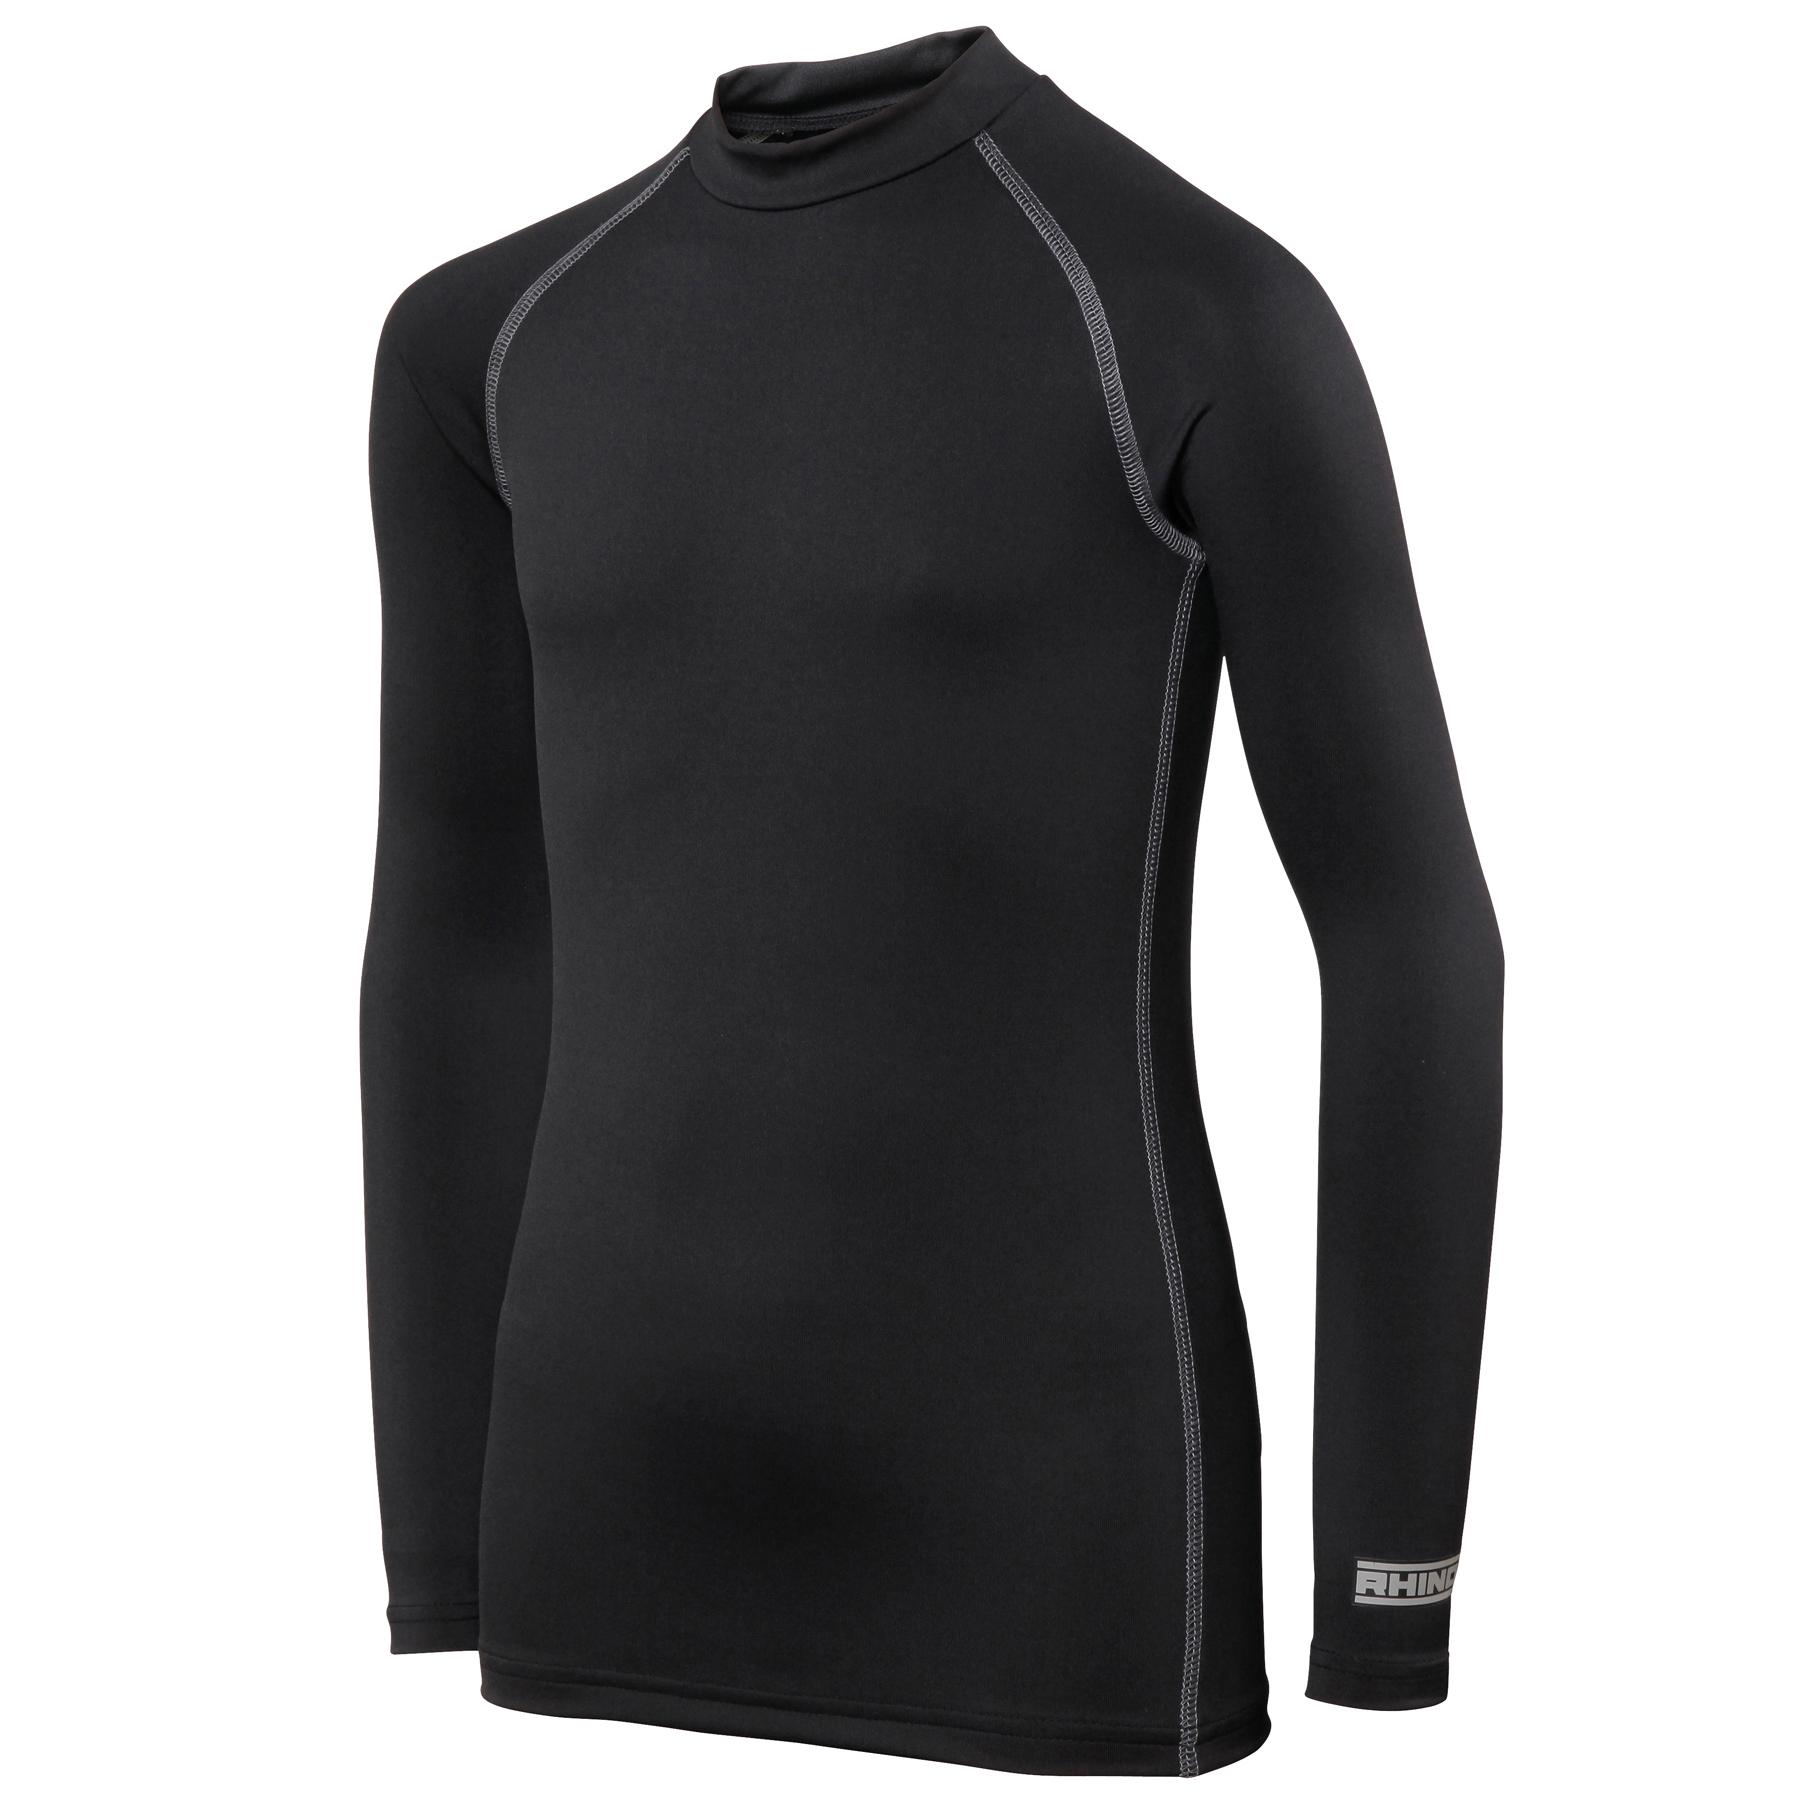 Rhino Childrens Boys Long Sleeve Thermal Underwear Base Layer Vest Top (SY-MY) (Black)